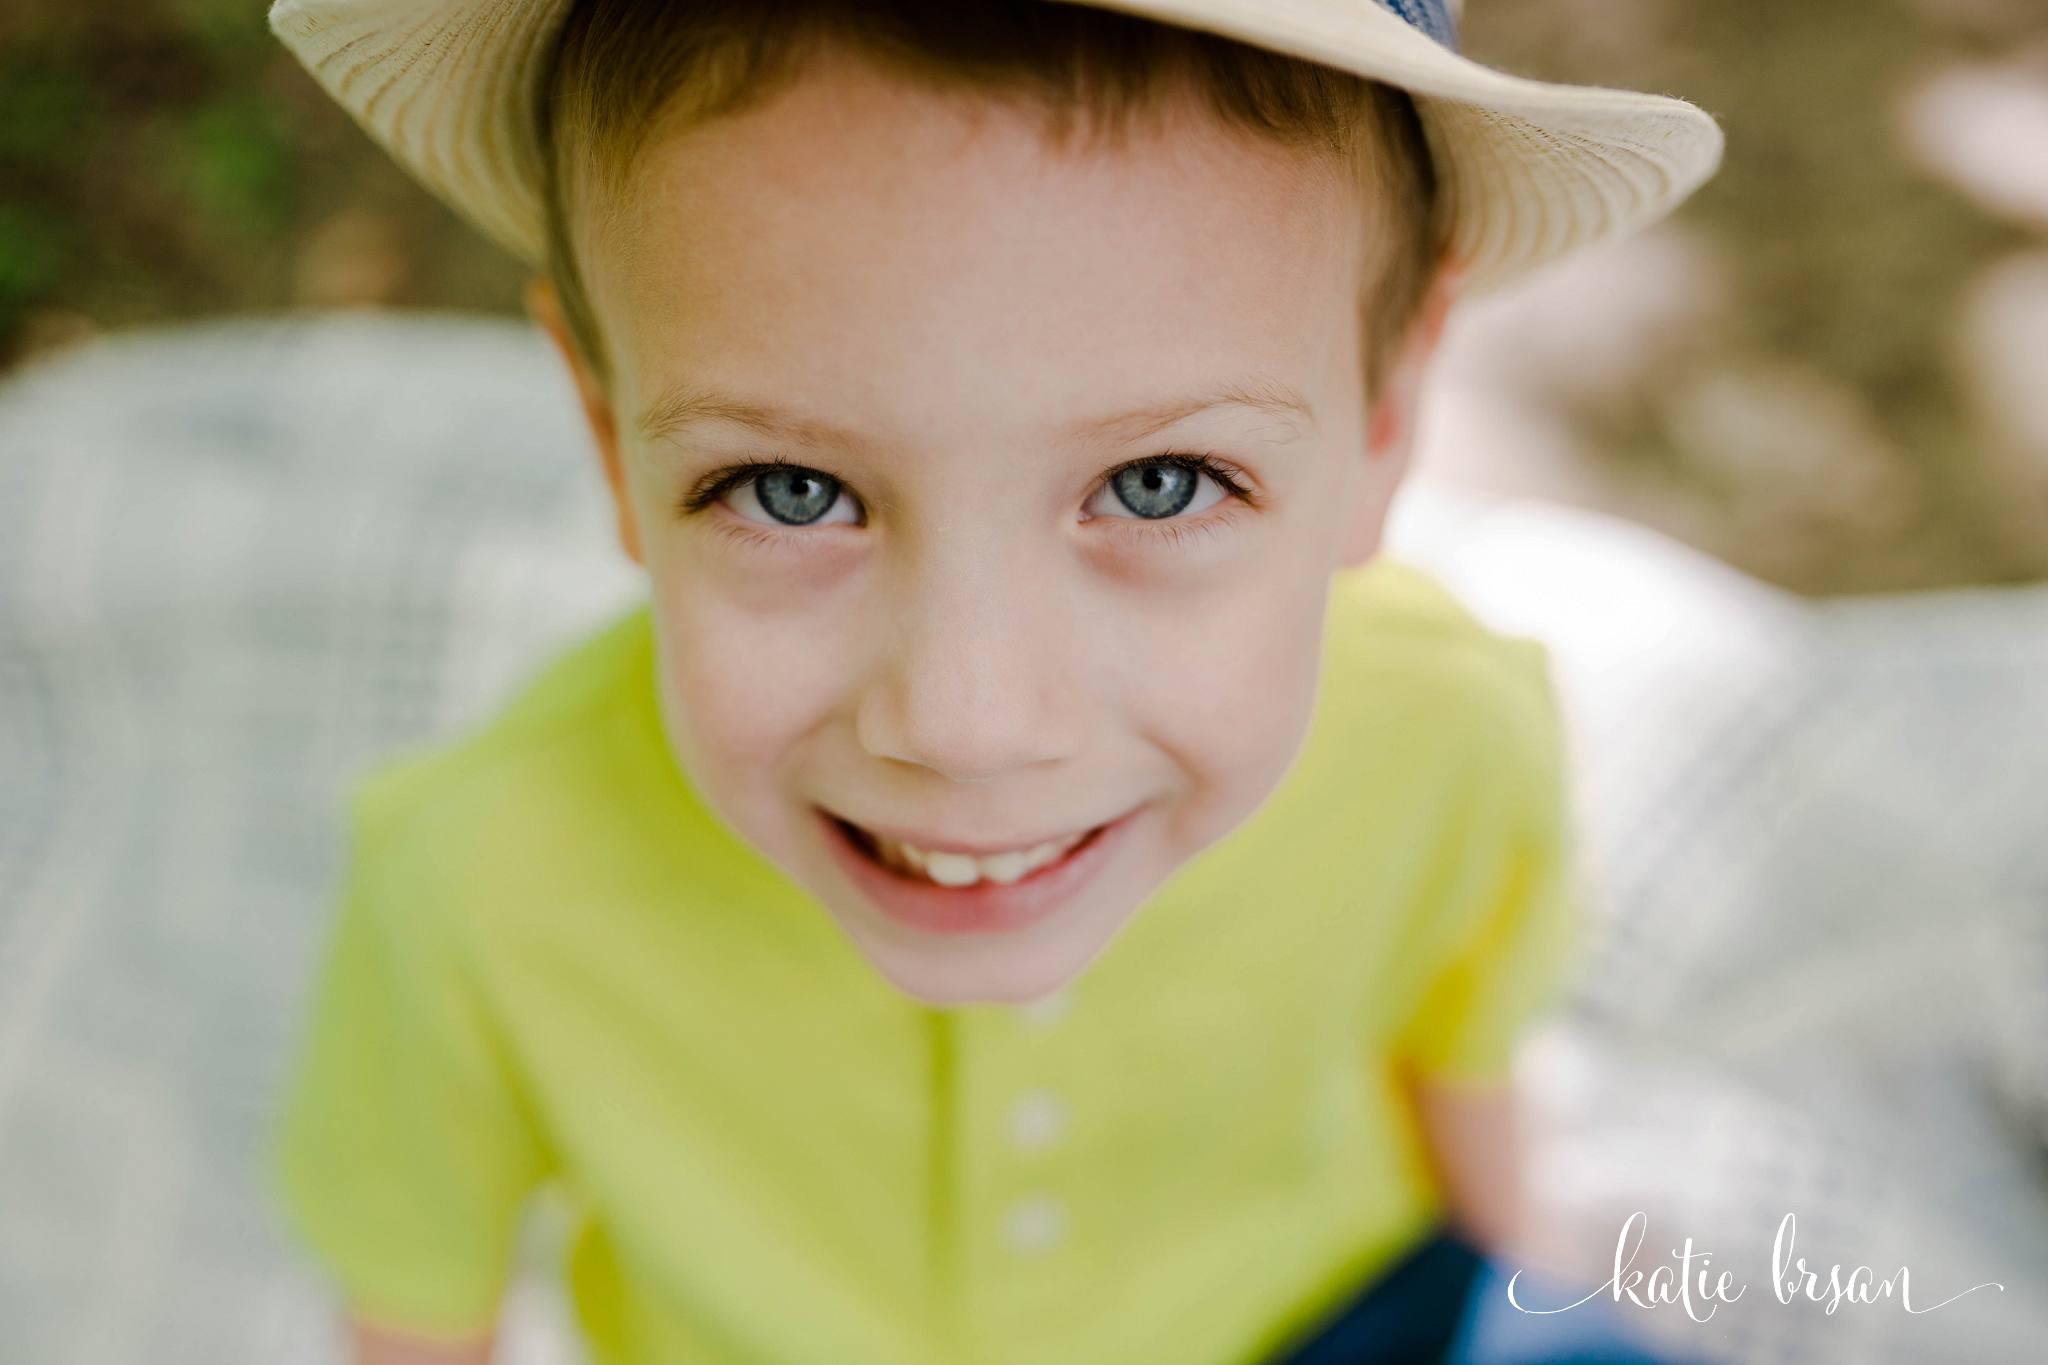 KatieBrsan-Shorewood-ChildPhotographer_0571.jpg